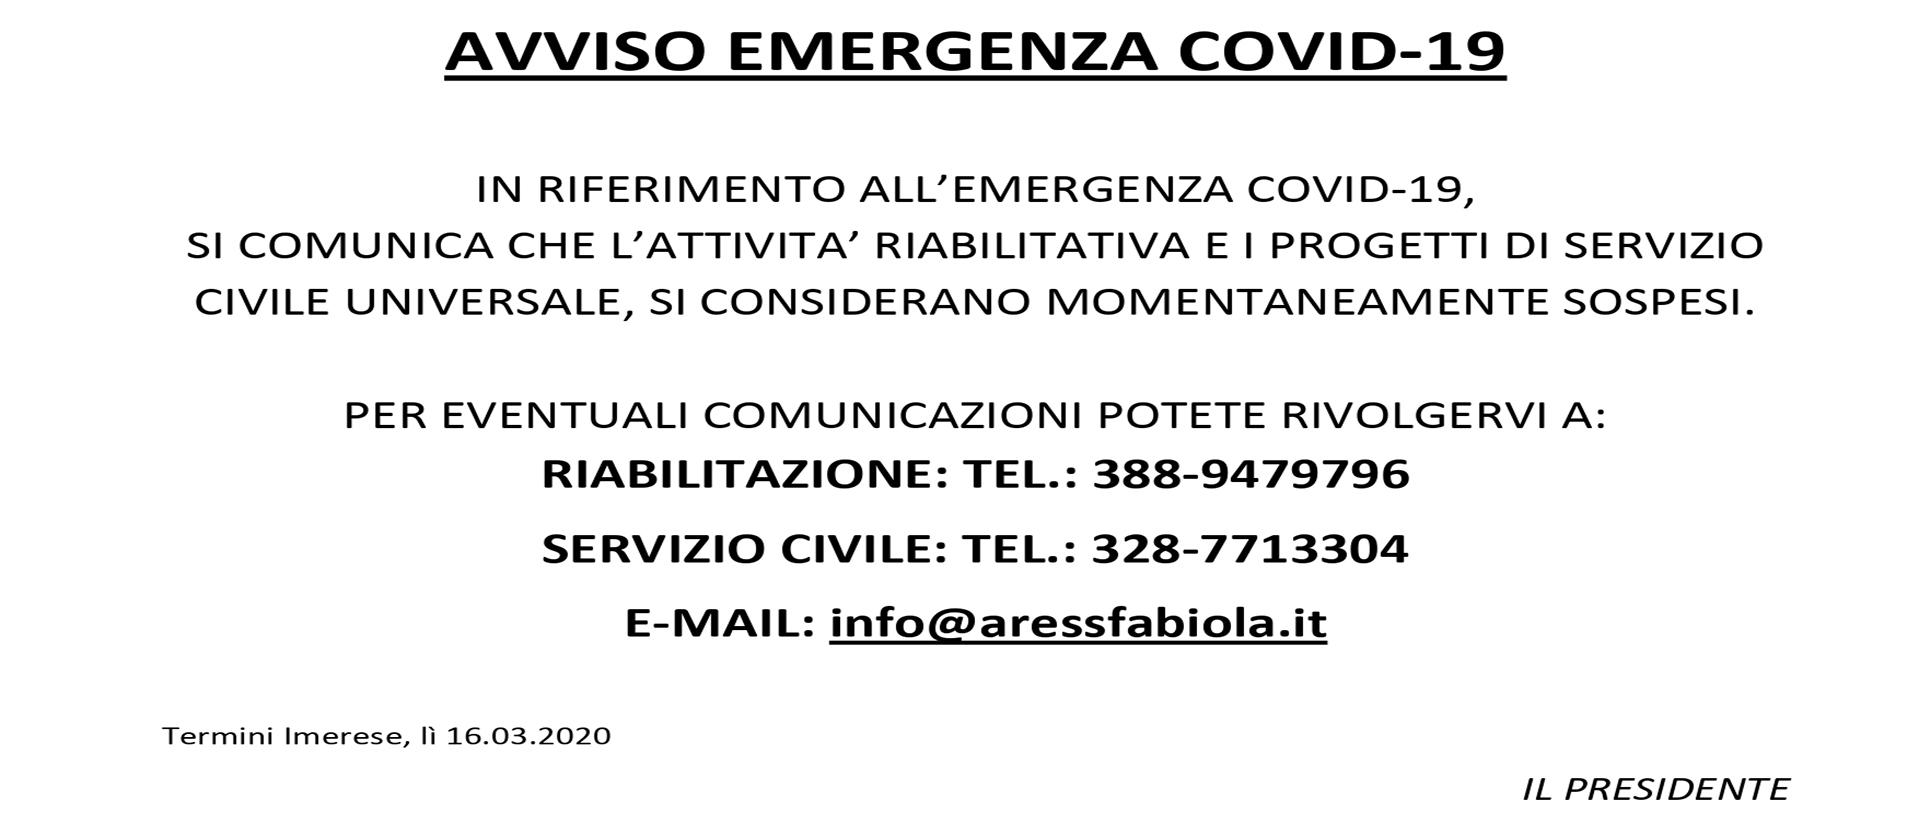 AVVISO_EMERGENZA_COVID_OK